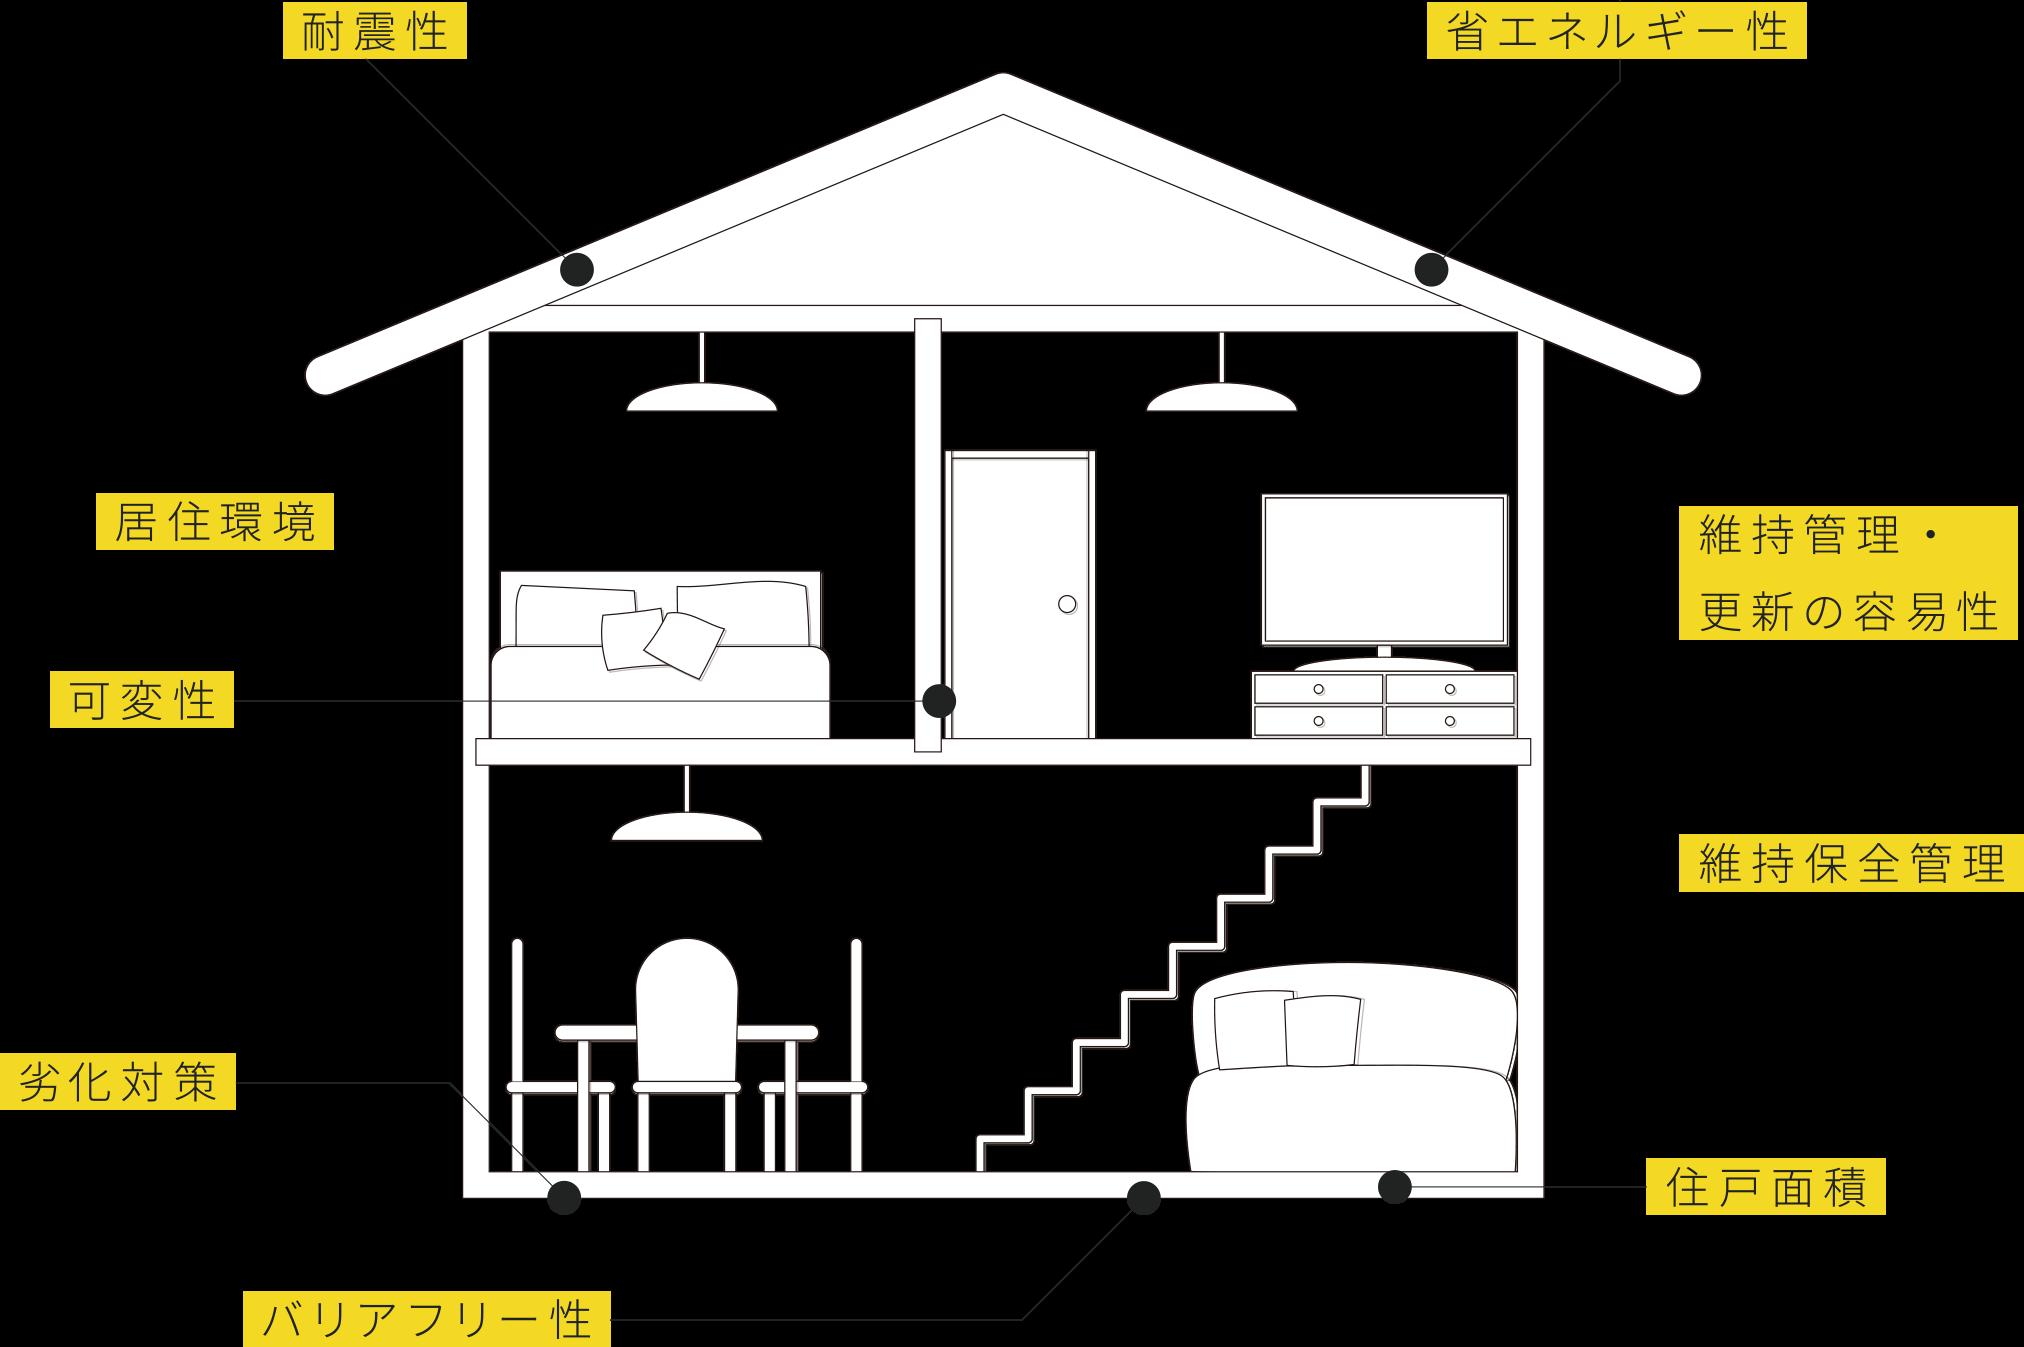 長期優良住宅の図